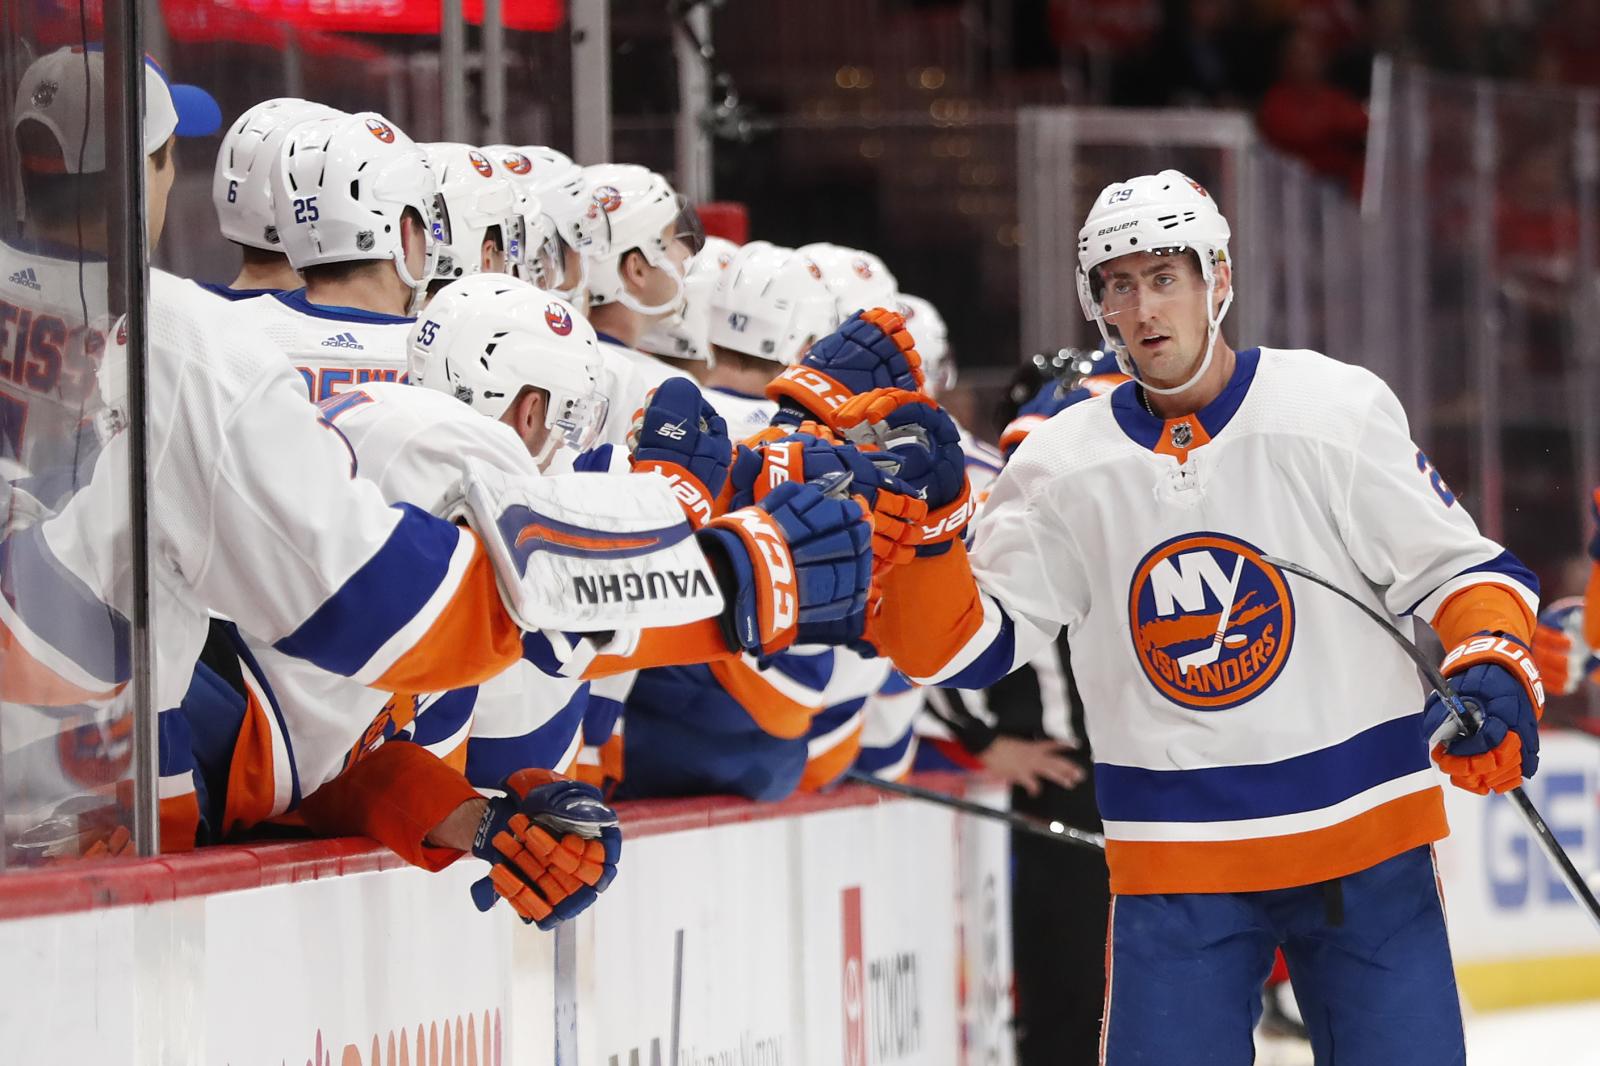 New York Islanders: Just How Good is Brock Nelson?